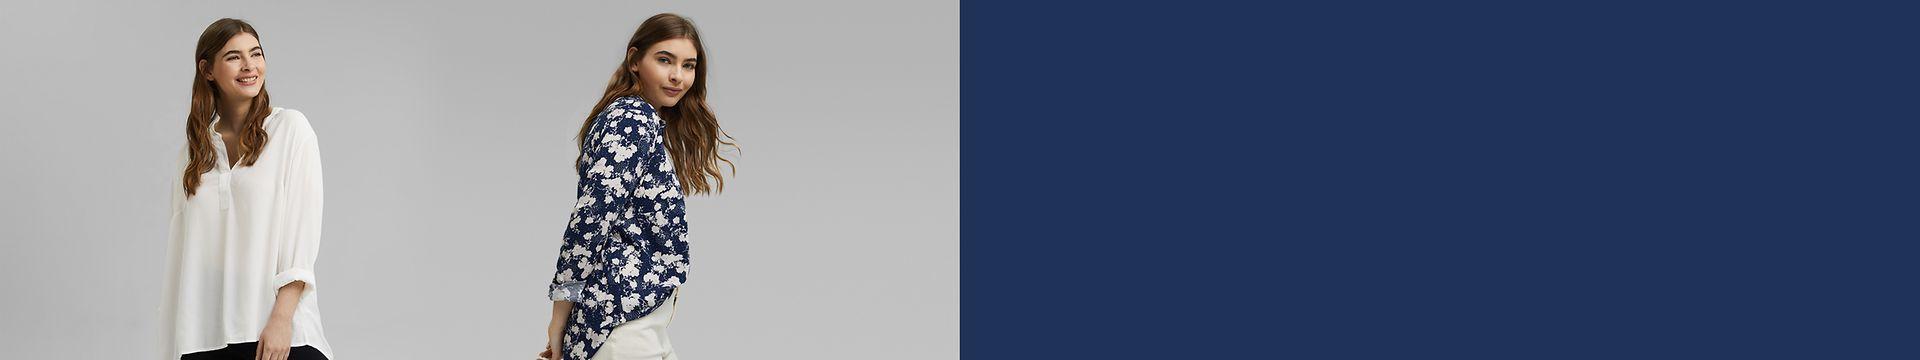 112021 - Women - TC Banner - Curvy - IMG